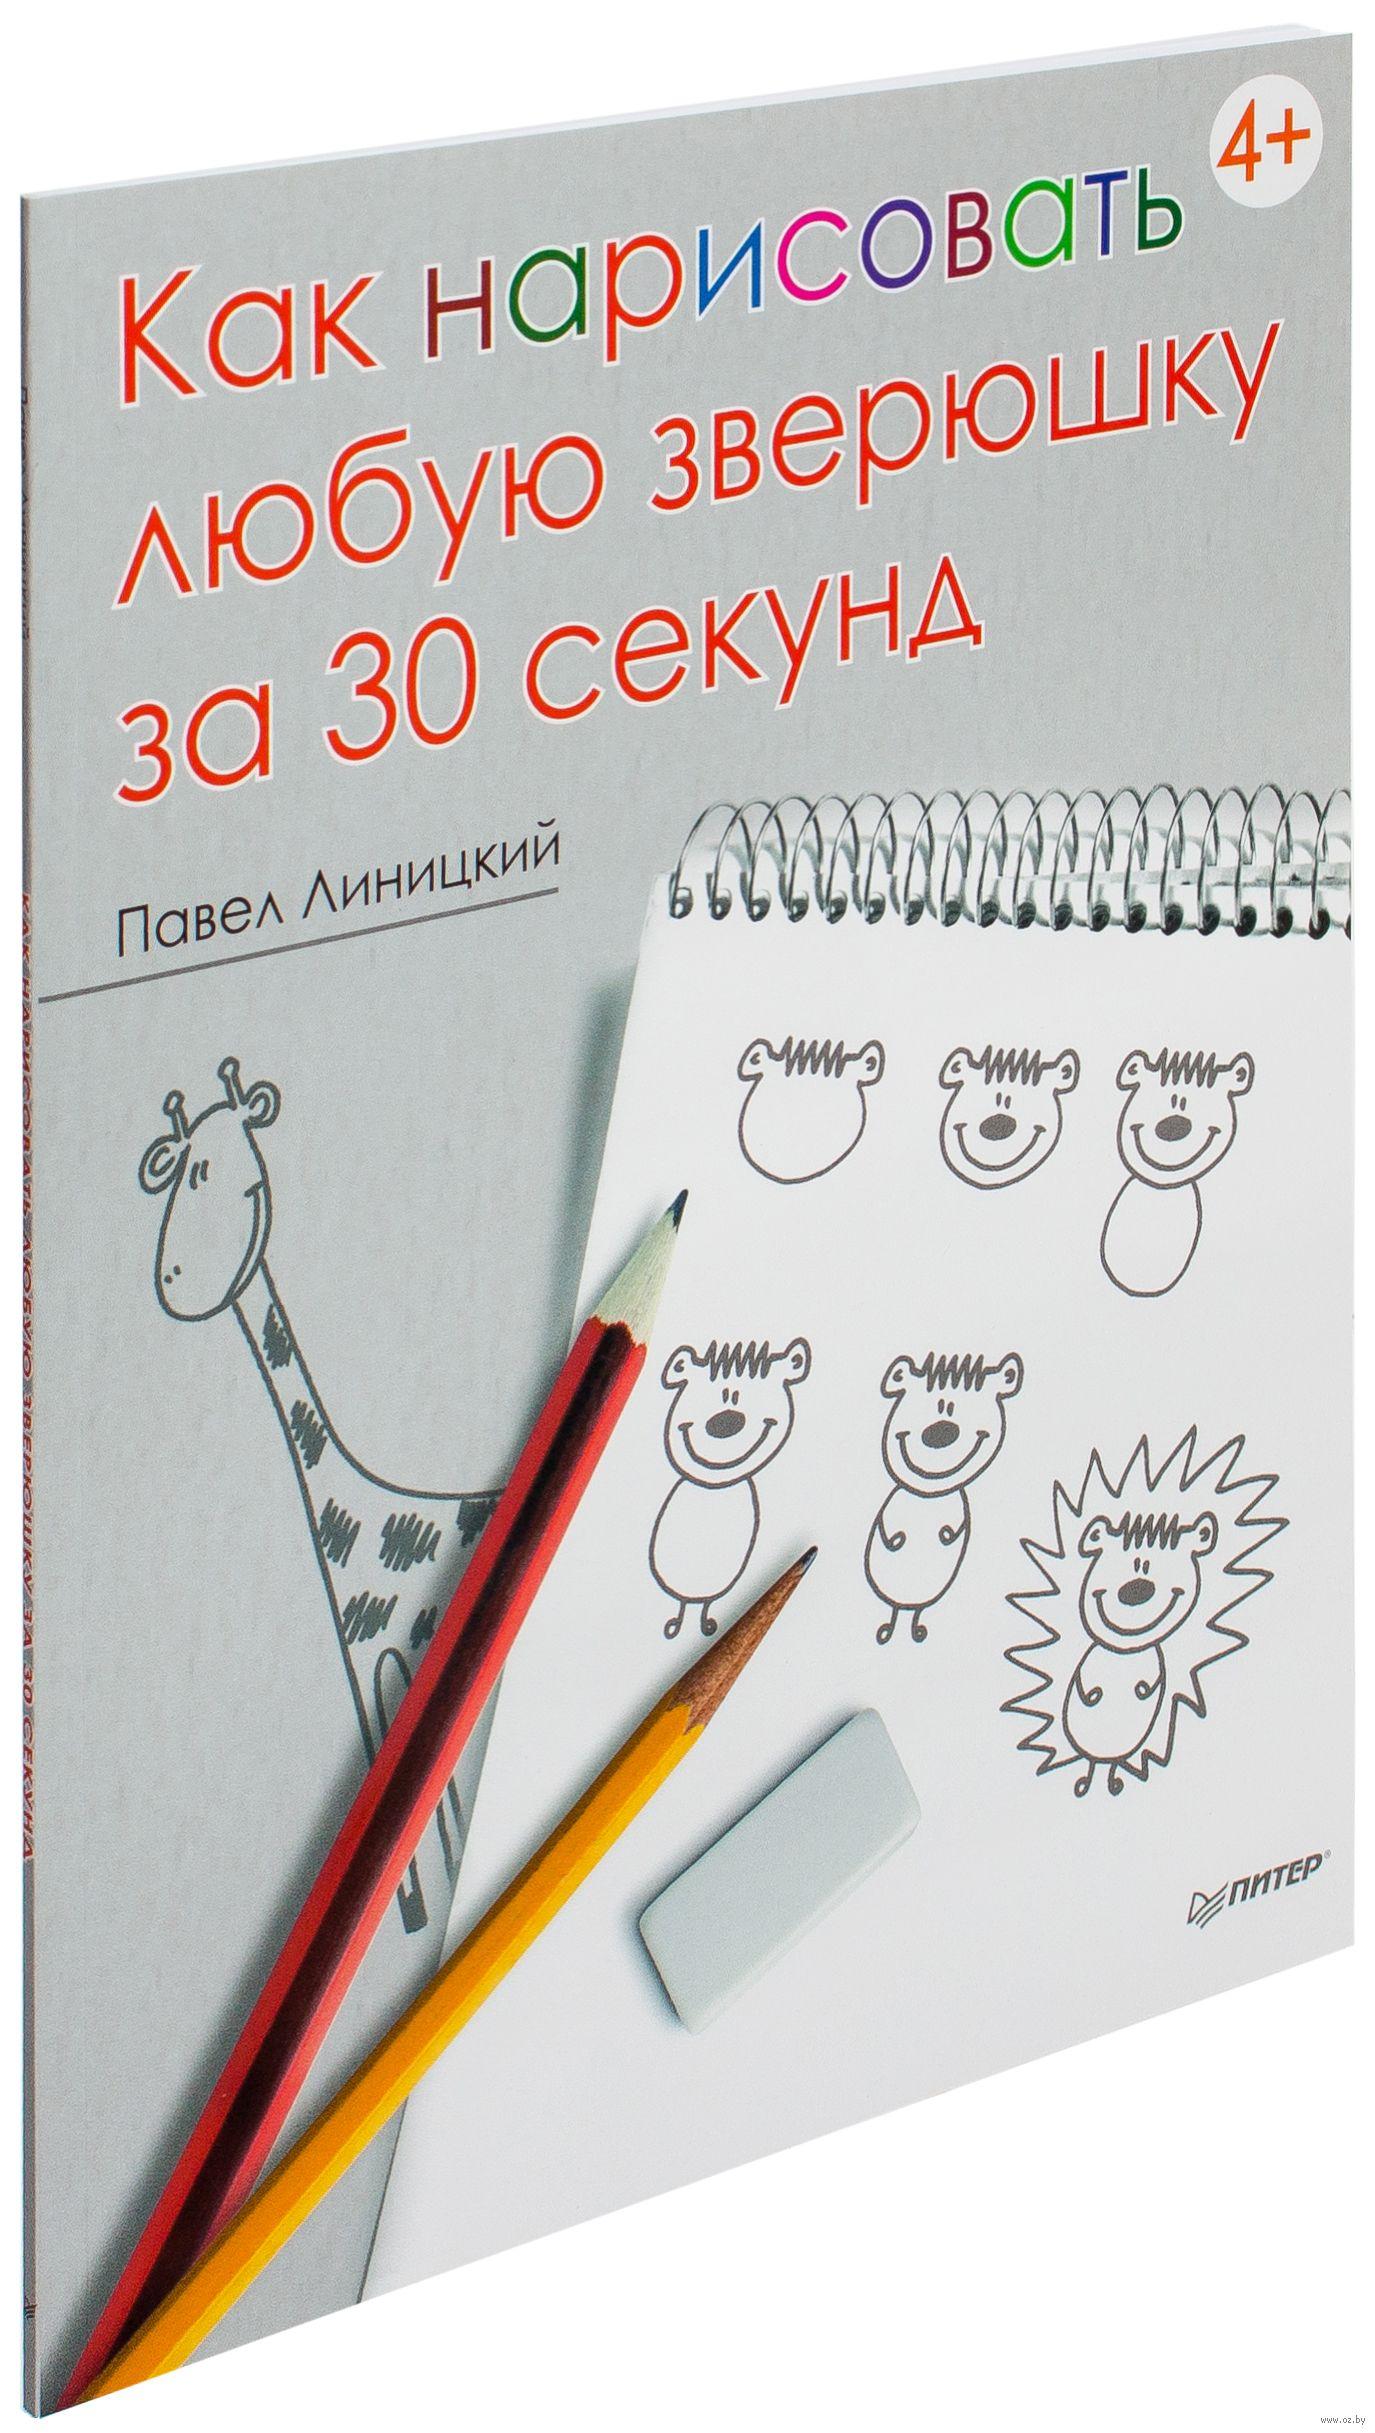 Красавицы открытки, идеи для рисунок за 30 секунд